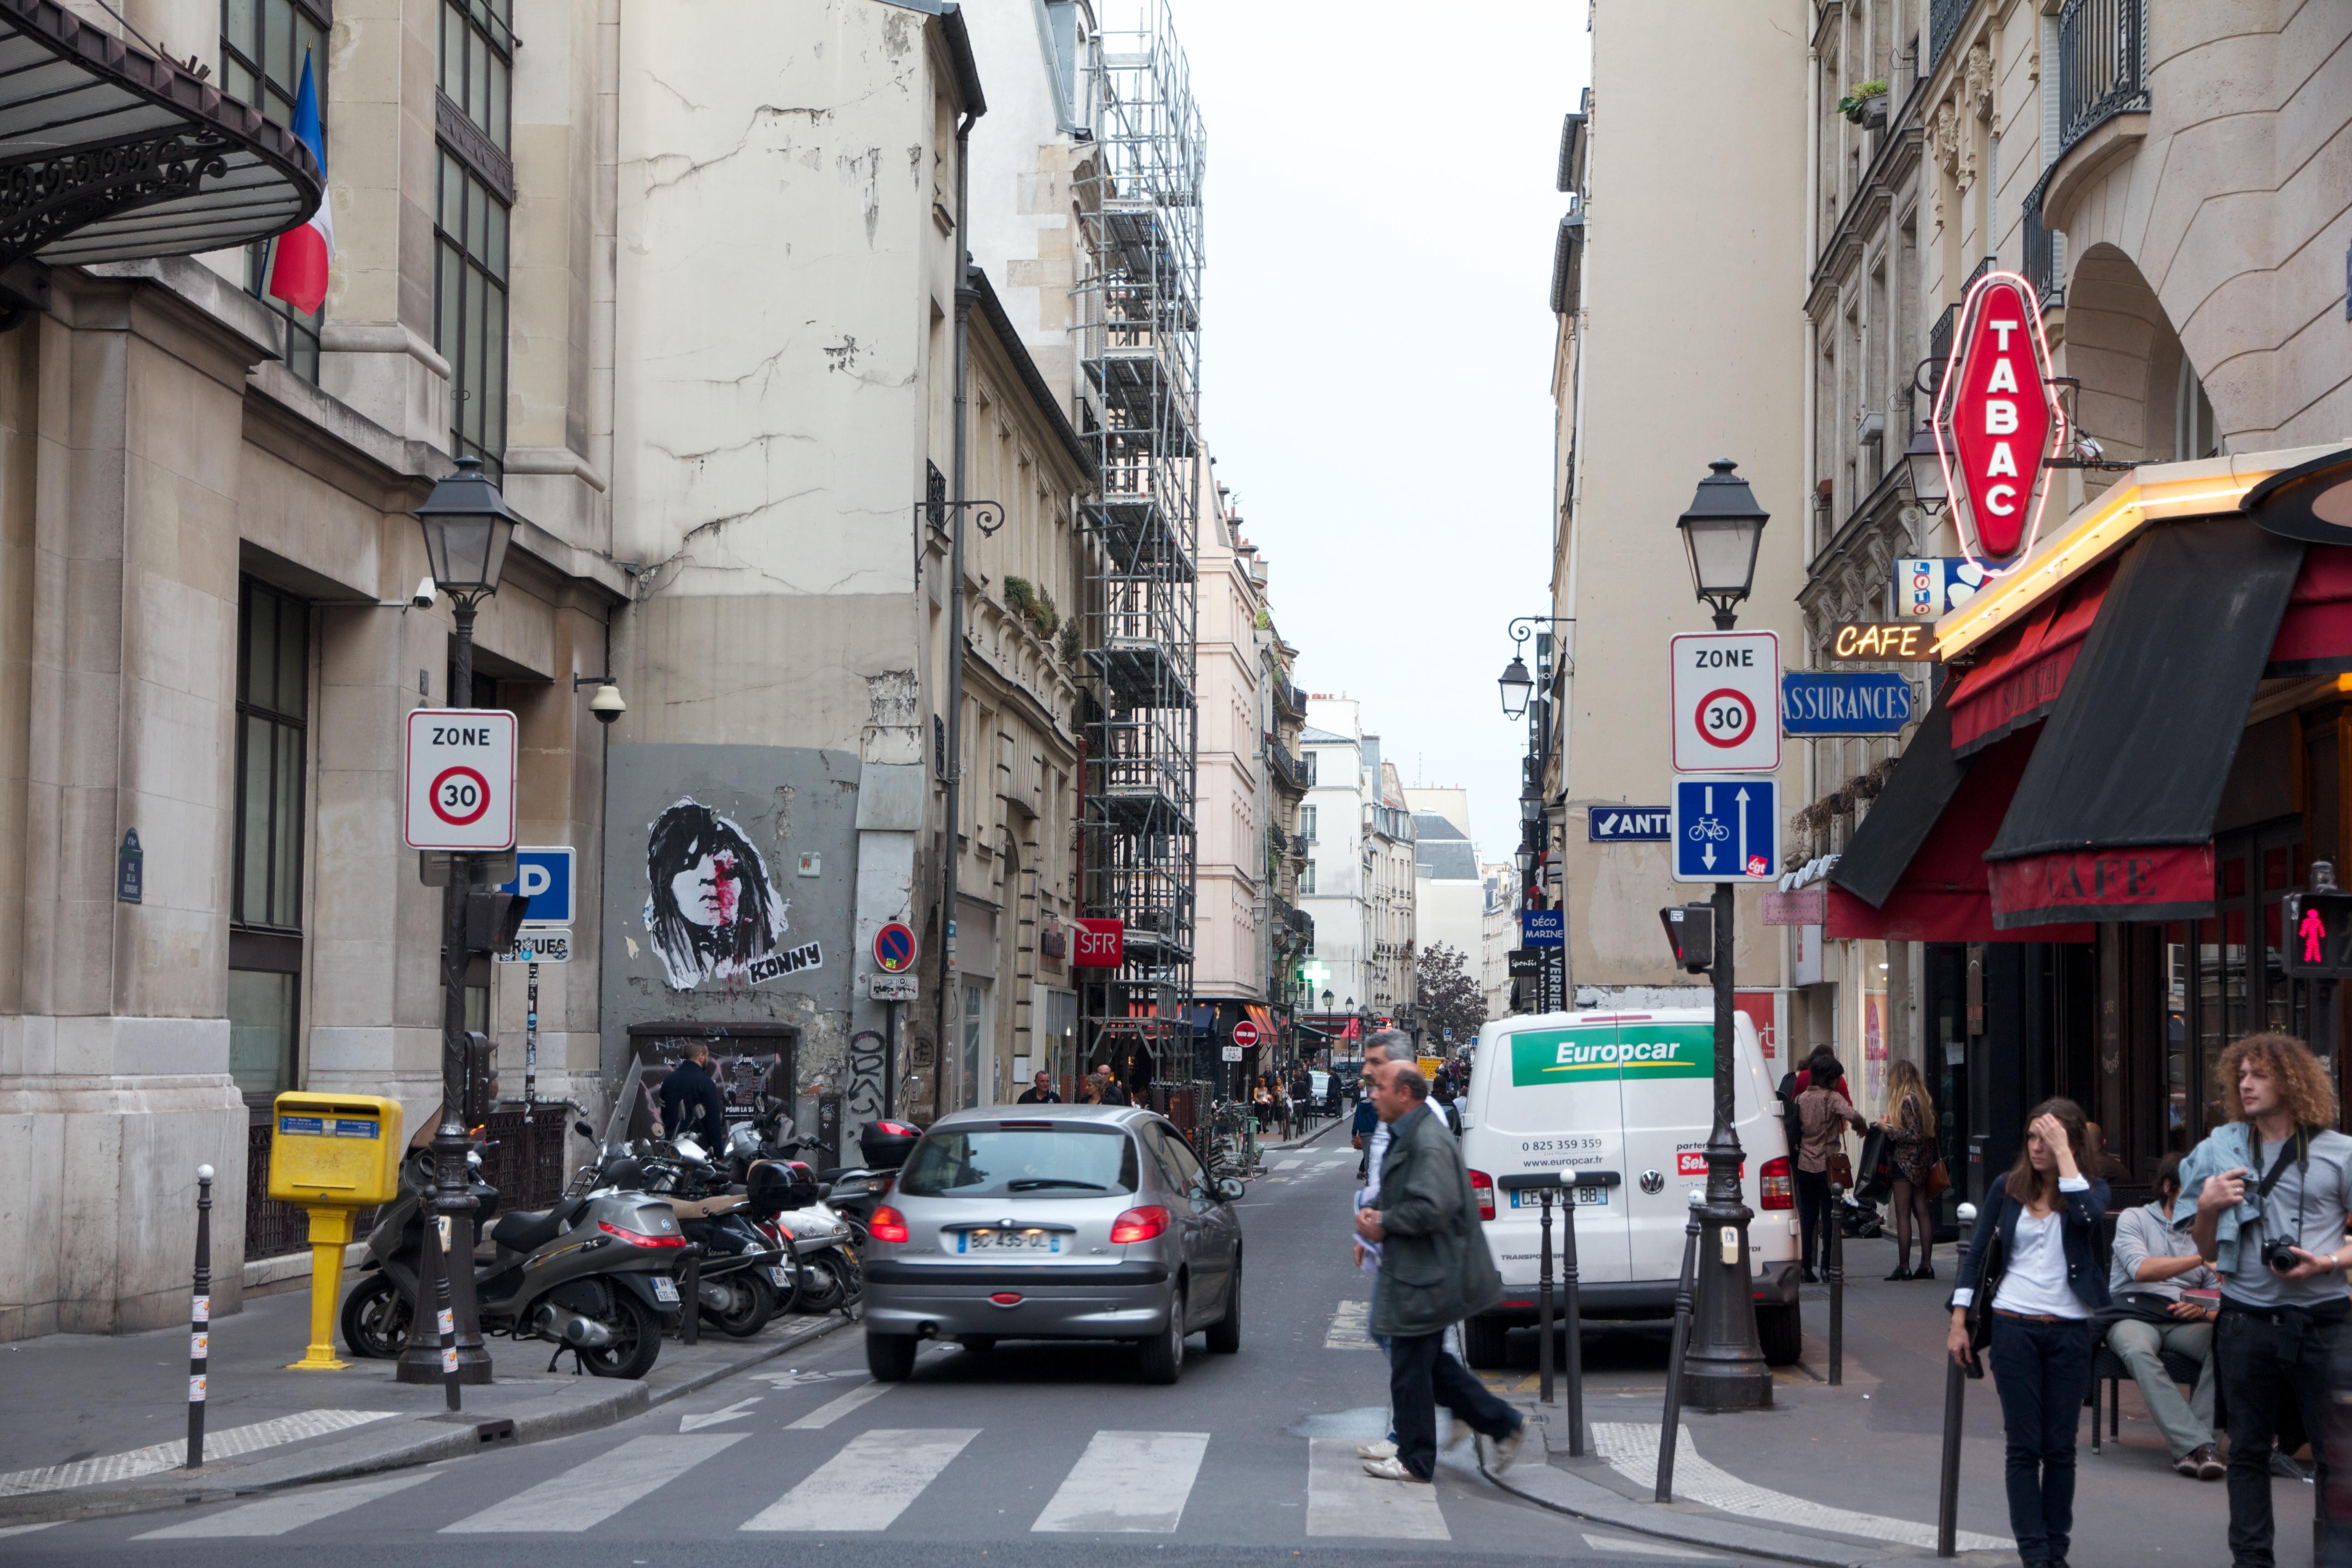 Rue De La Deco file:rue de la verrerie, paris 2012 - wikimedia commons